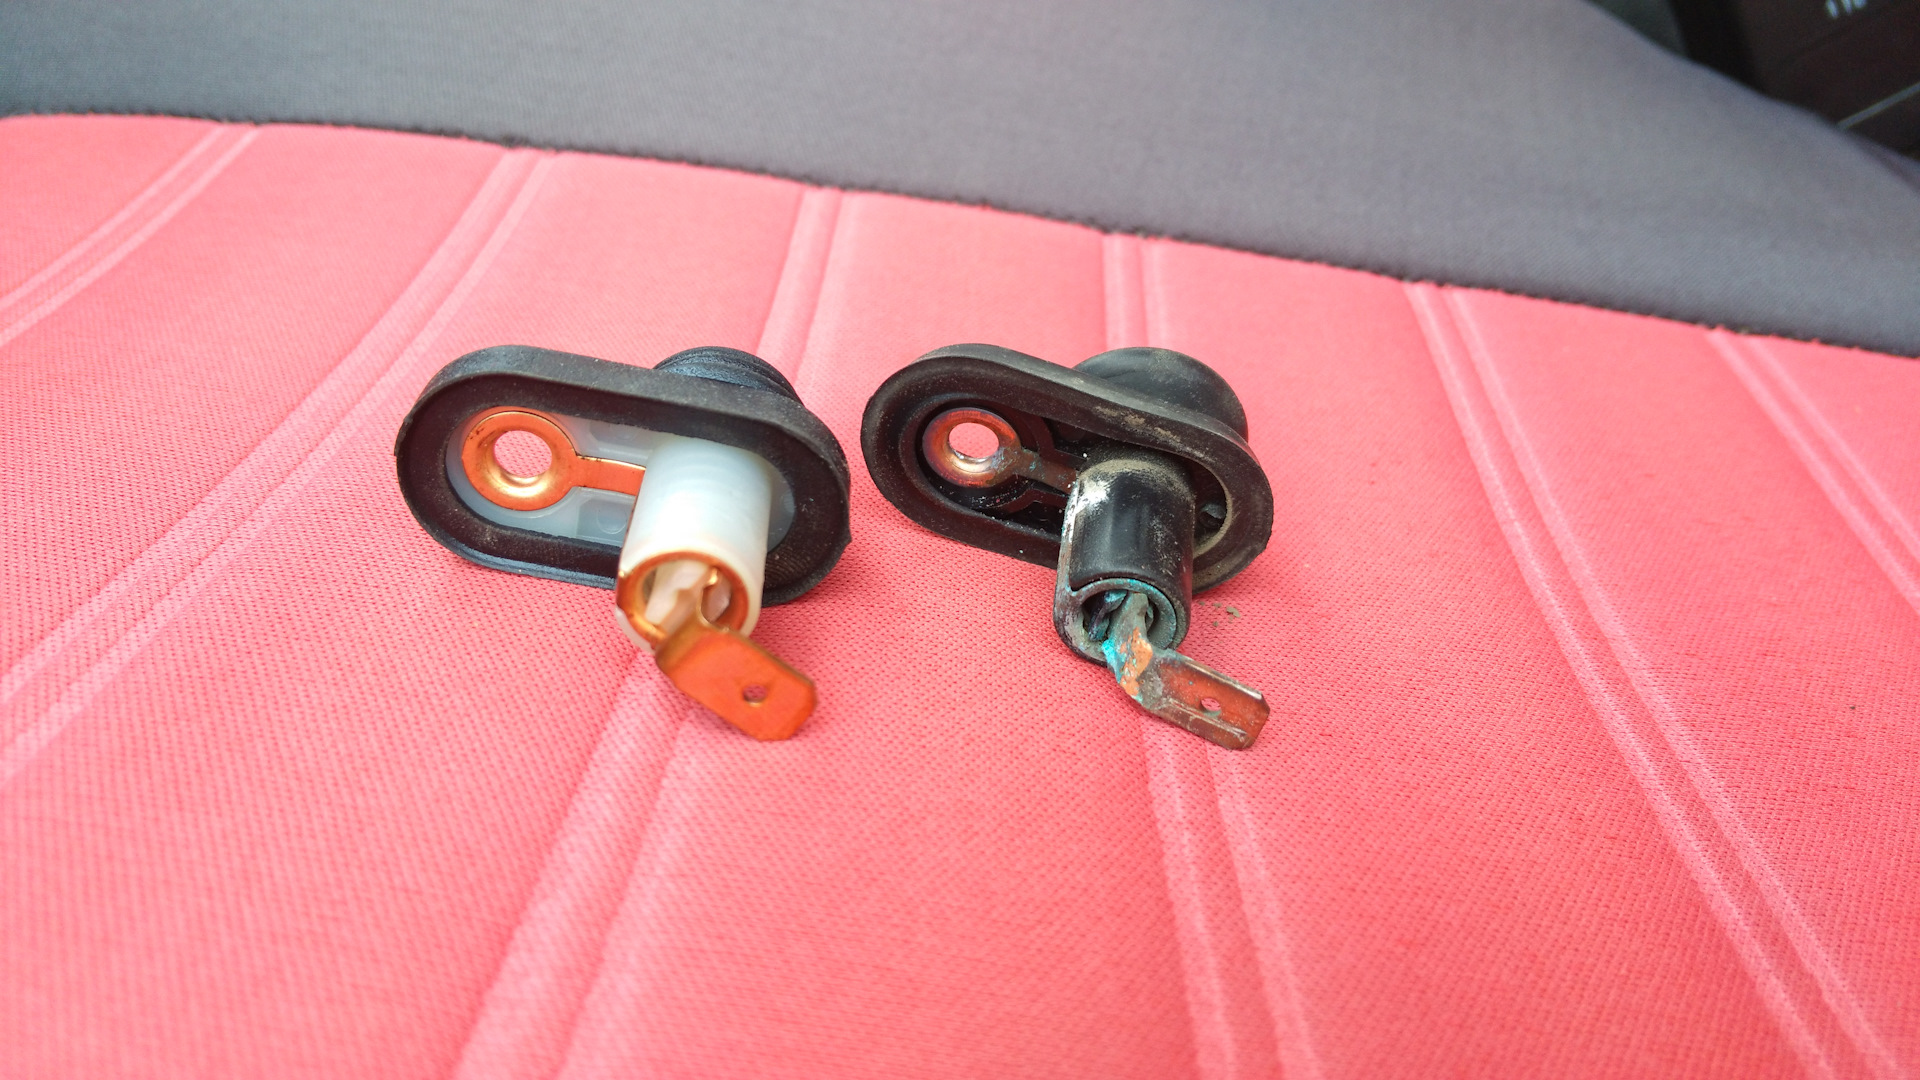 концевик в багажник матиз фото ведро экскаватора